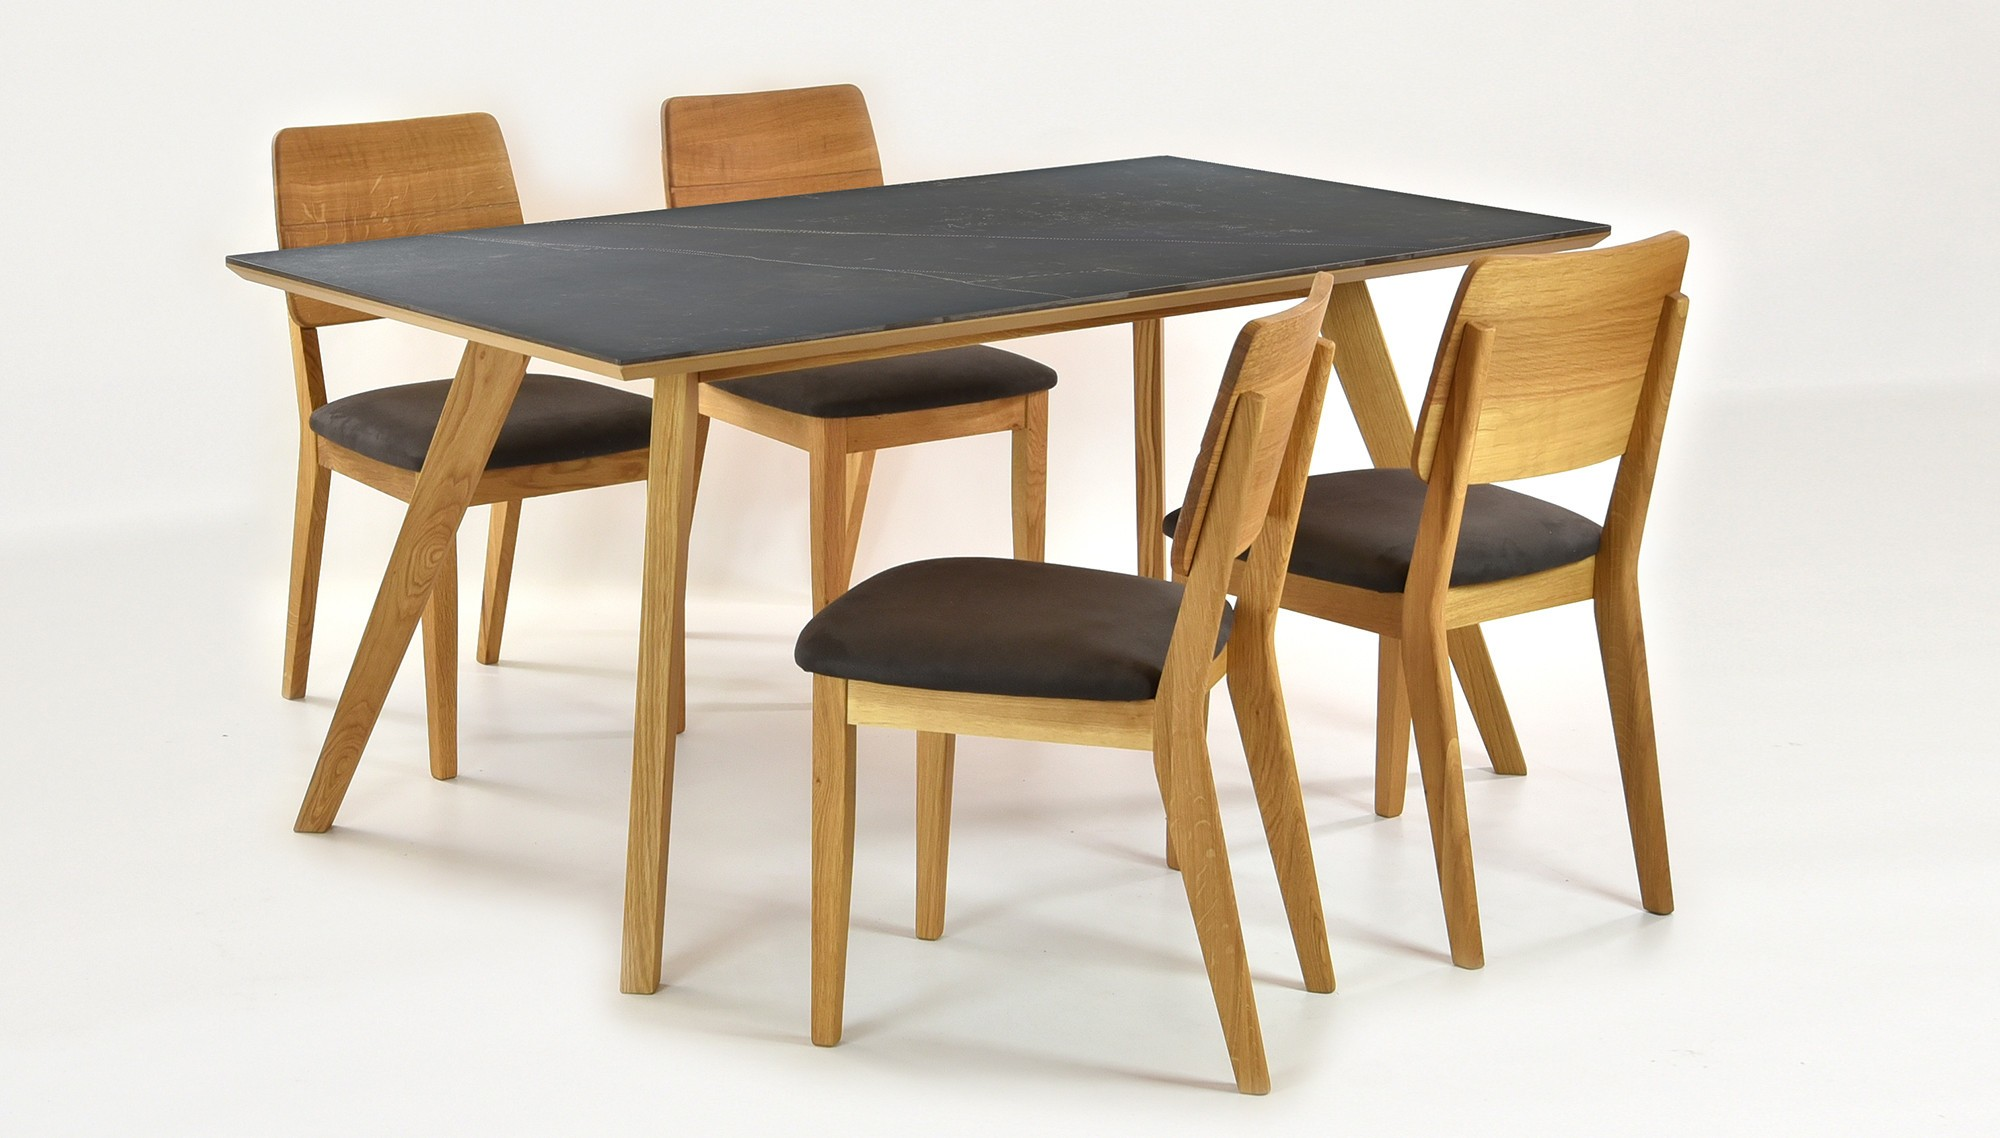 6610f614a369f Jedálenský stôl pre 6 osôb (Stôl dekton 160 x 90, 4 x stolička Norman)